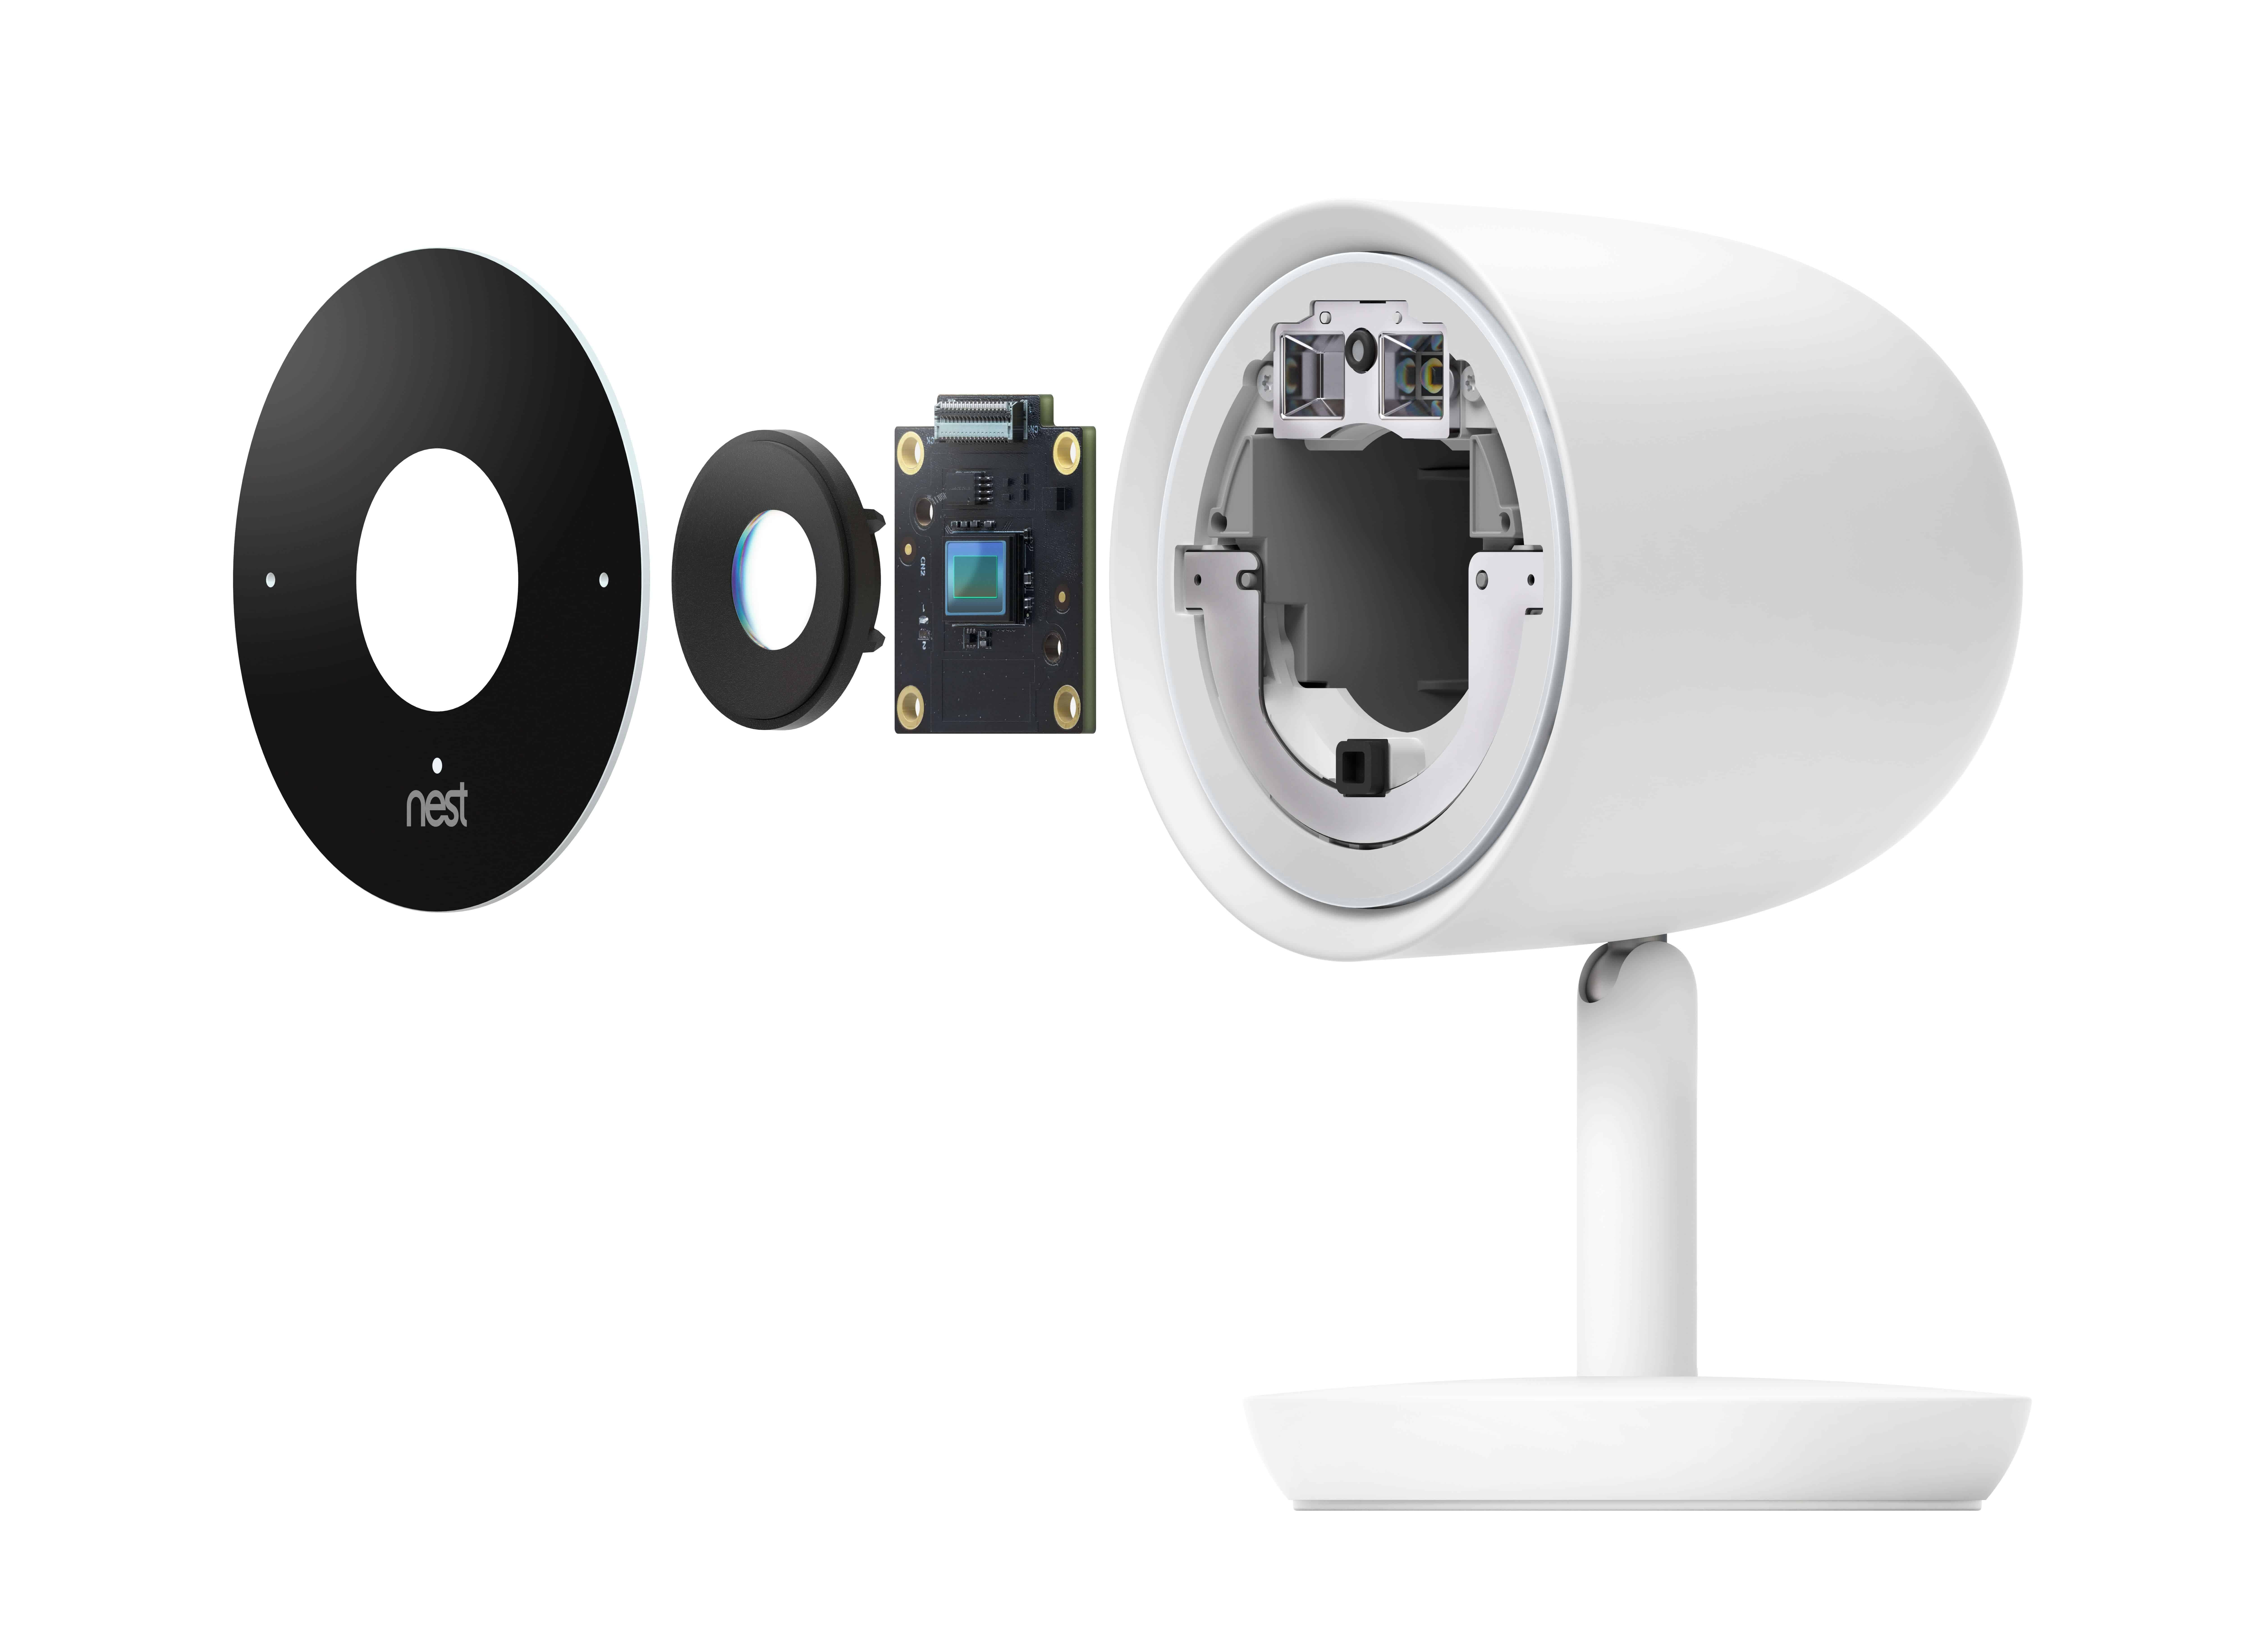 Best Wireless Outdoor Security Cameras - Nest